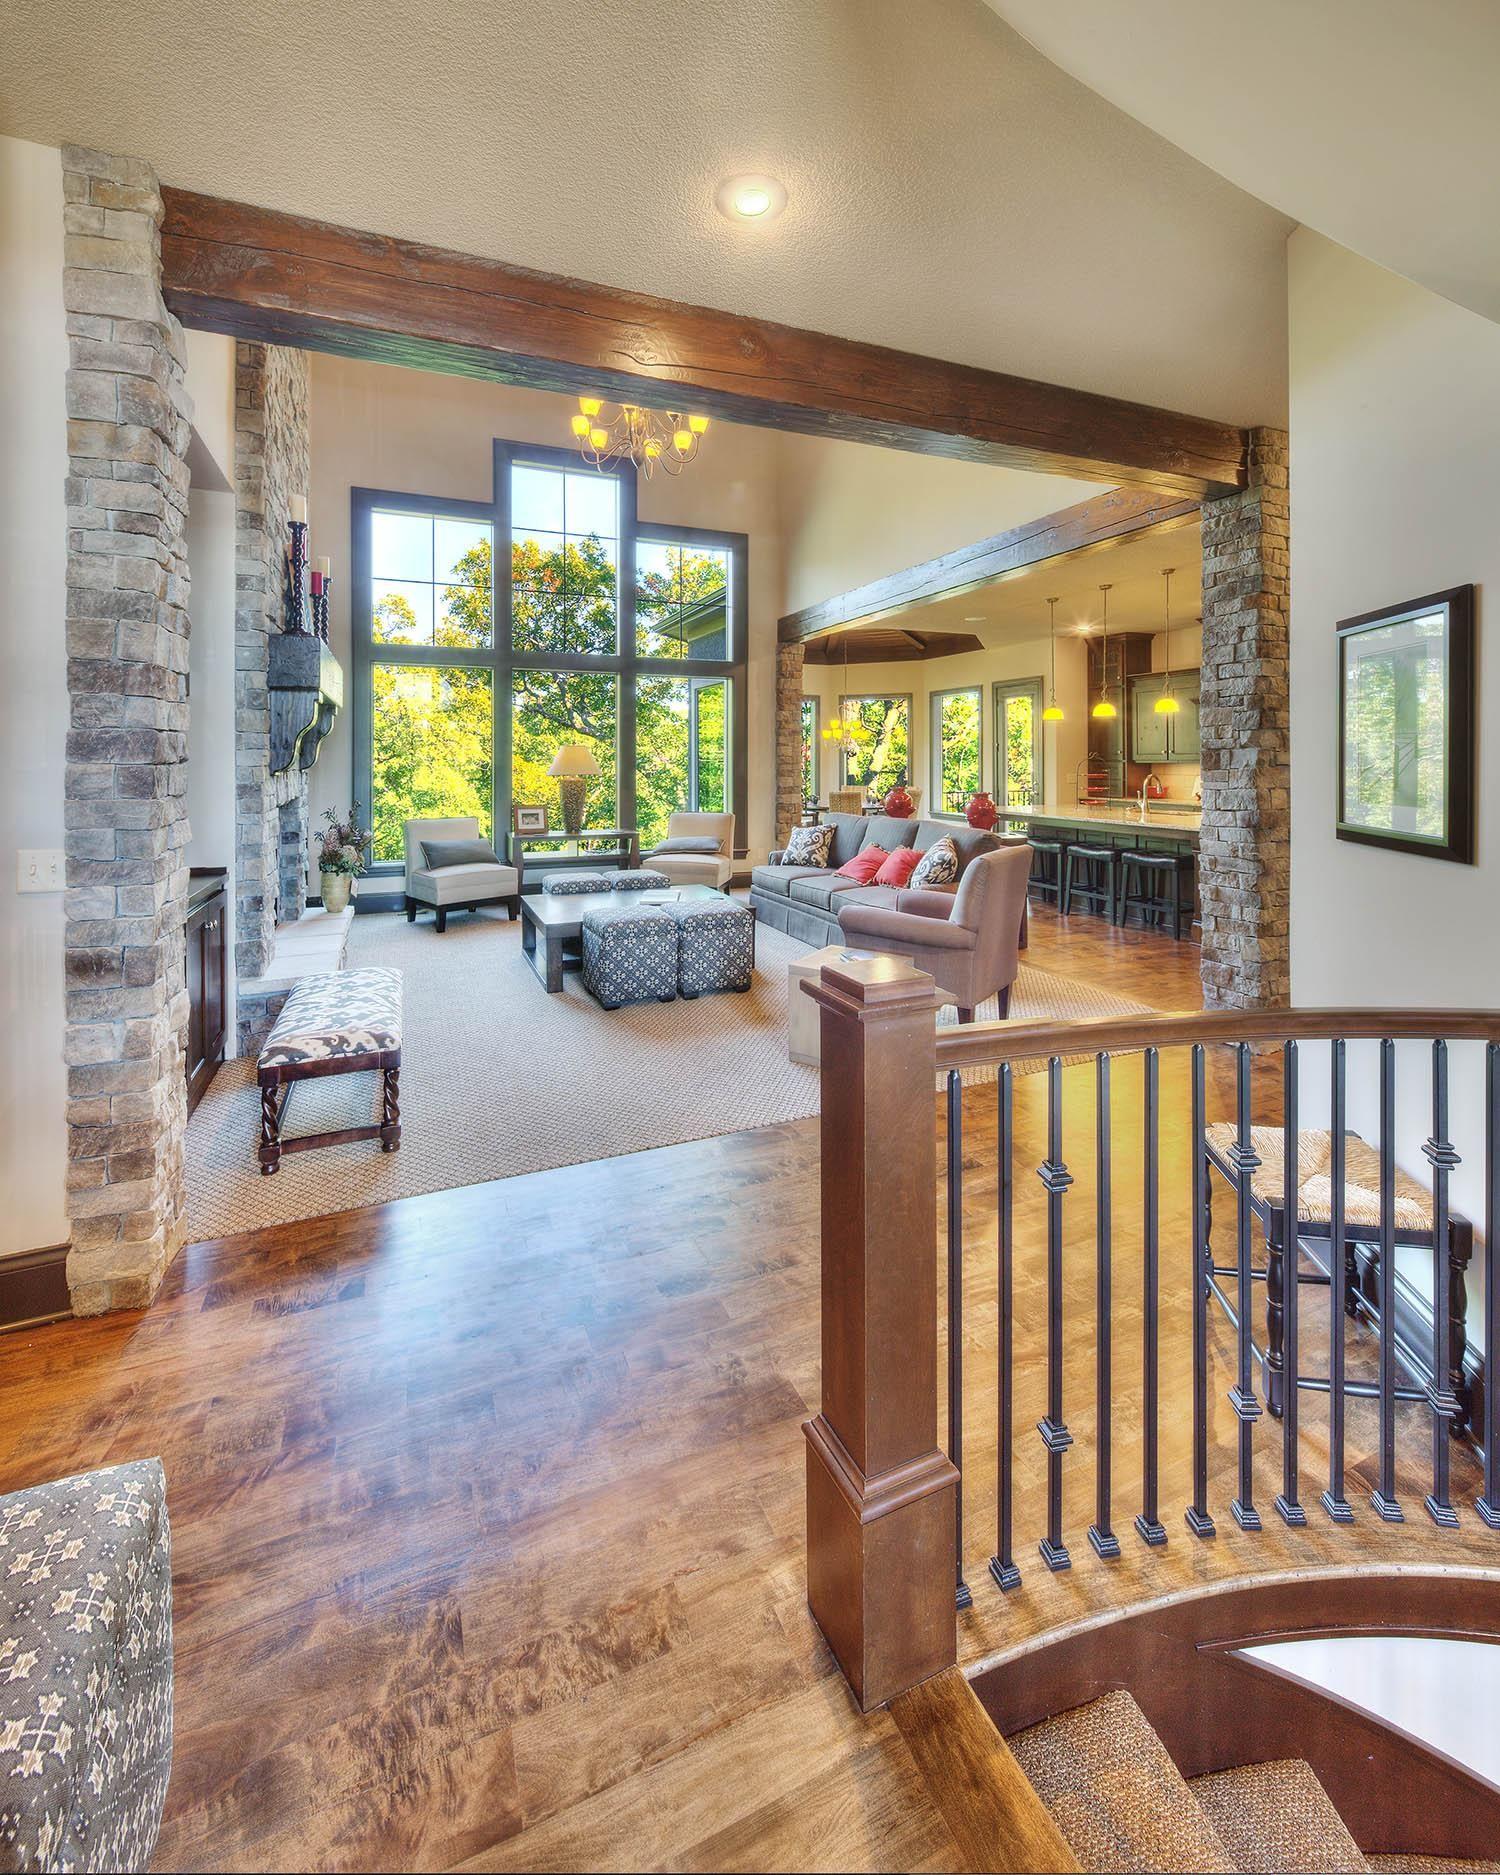 8 8x8  Home, Custom homes, Floor plan design